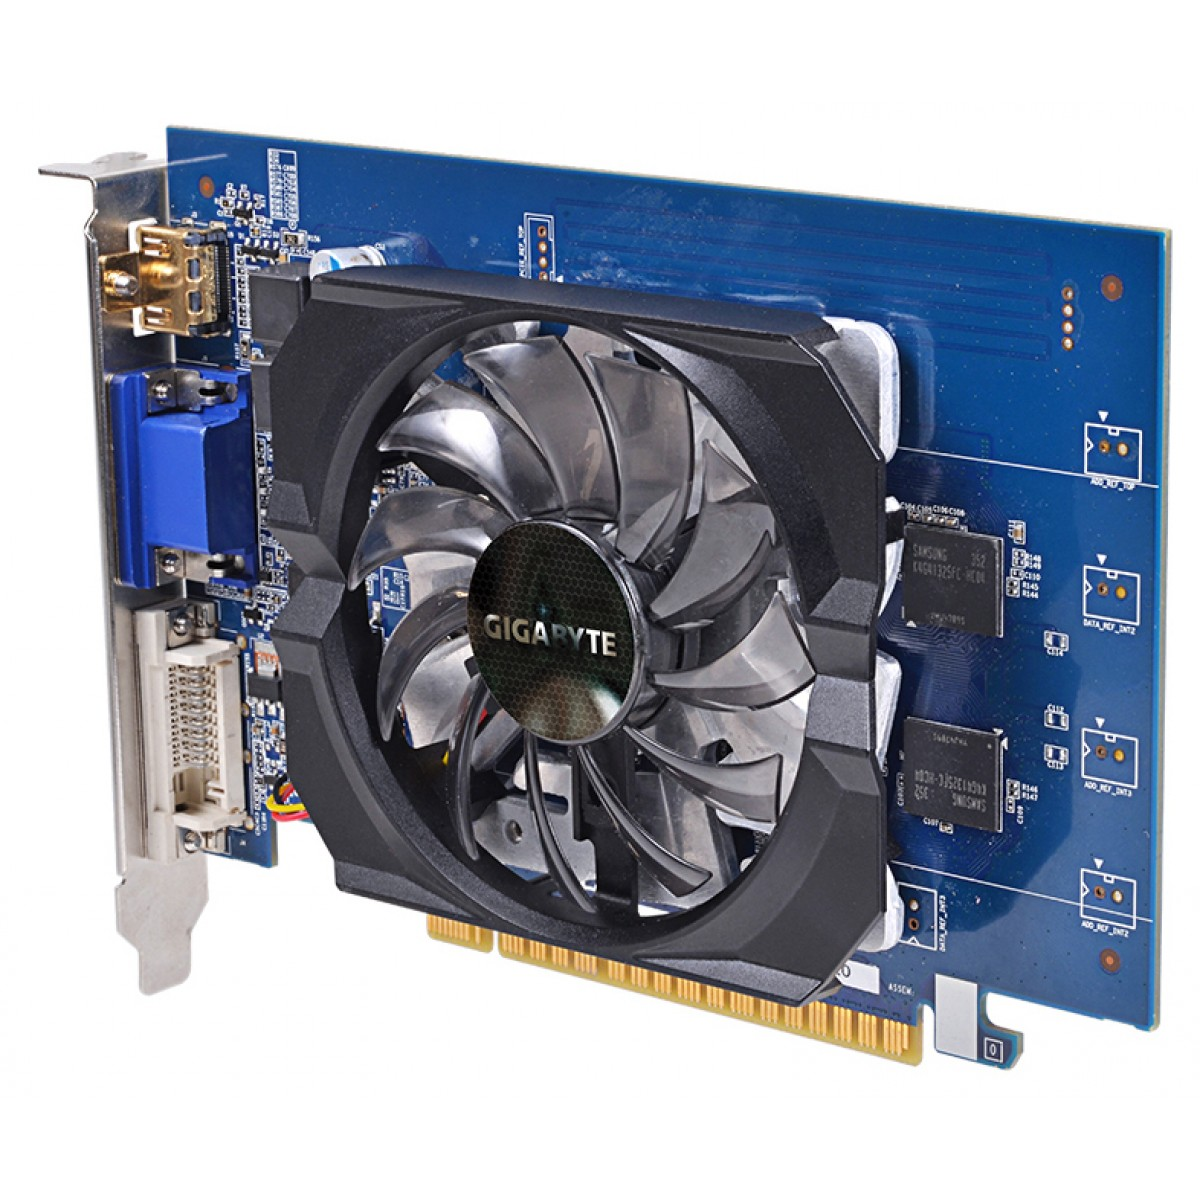 PLACA DE VÍDEO GIGABYTE GEFORCE GT 730 2GB GDDR5 64 BITS - GV-N730D5-2GI